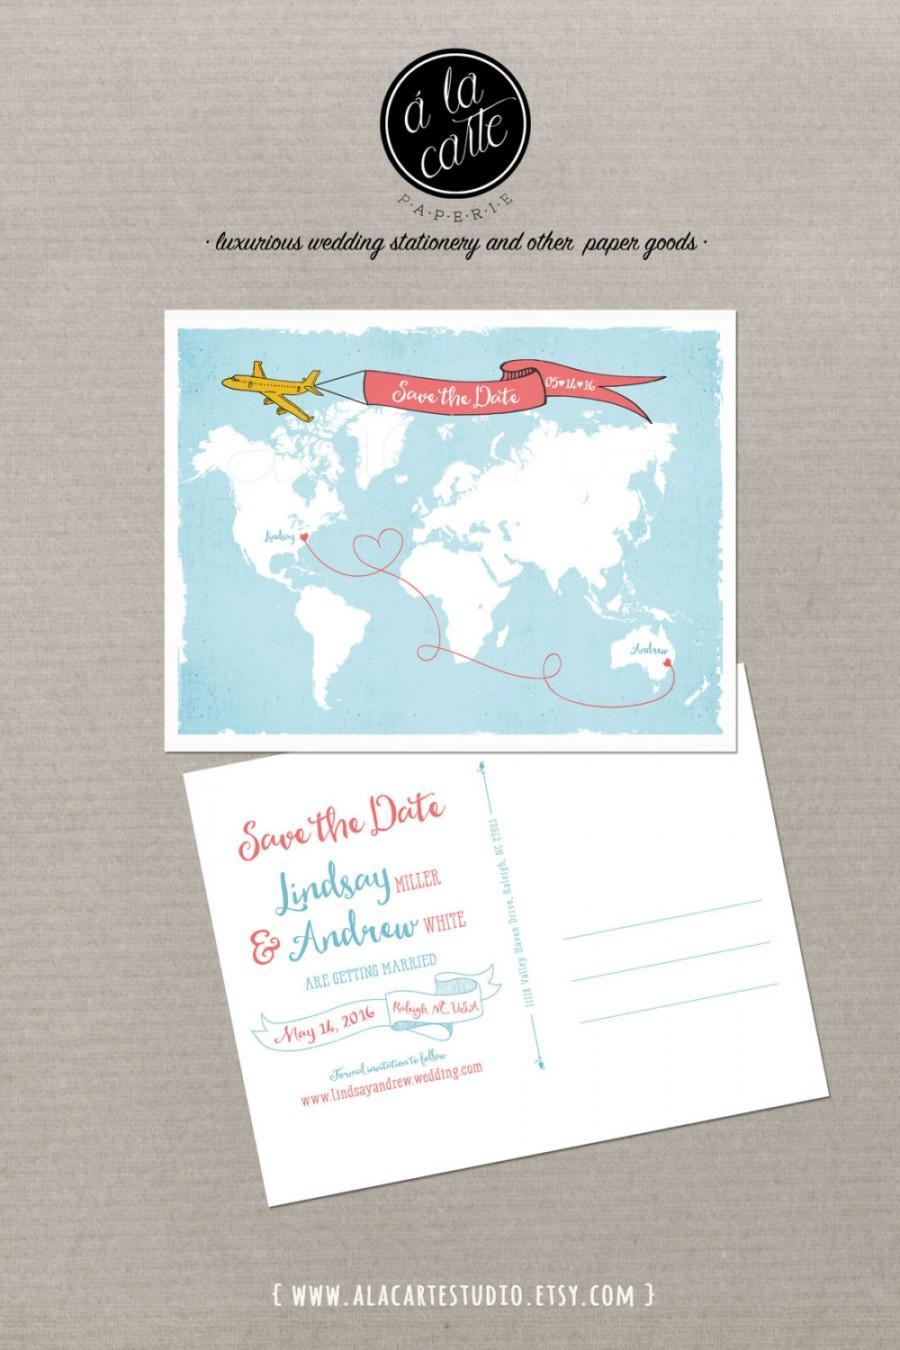 http://s3.weddbook.com/t4/2/4/3/2439562/world-map-international-couple-wedding-save-the-date-card-airplane-with-banner-usa-australia-wedding.jpg